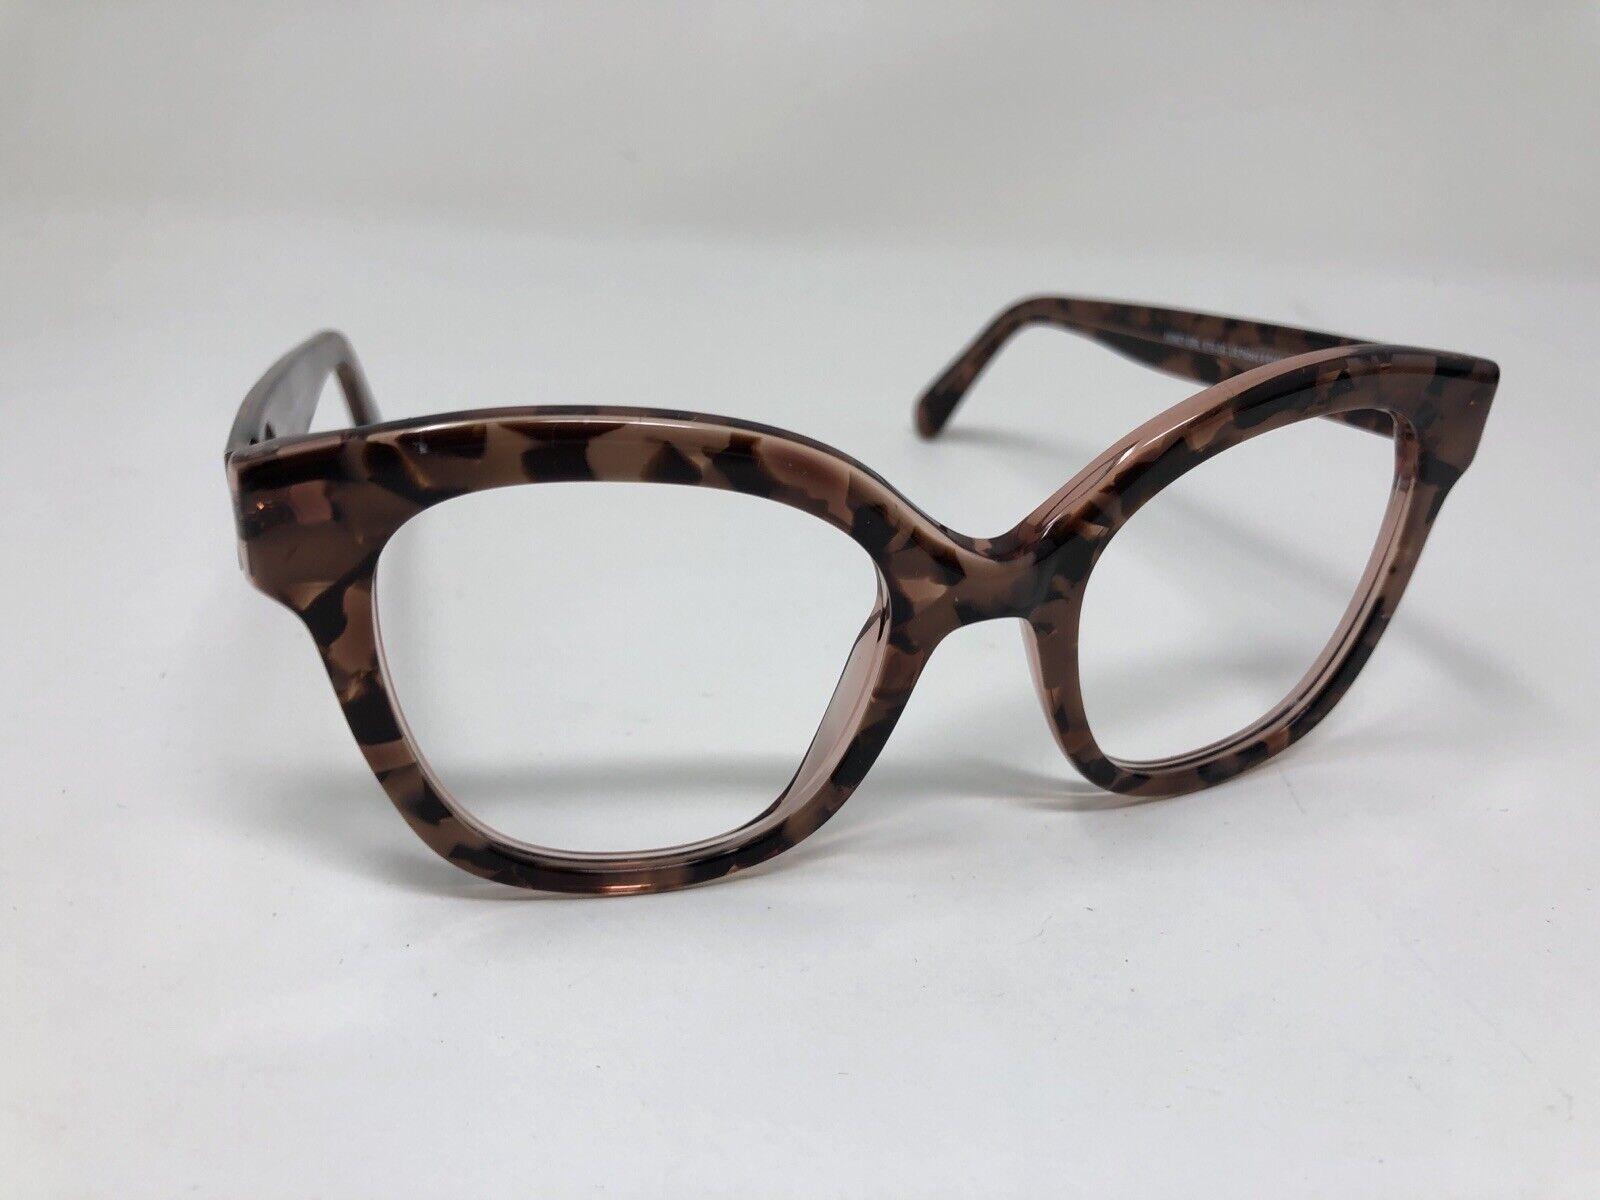 Authentic Maui Jim Sunglasses Honey Girl MJ751-09A 51[]21 Peach Havana P234